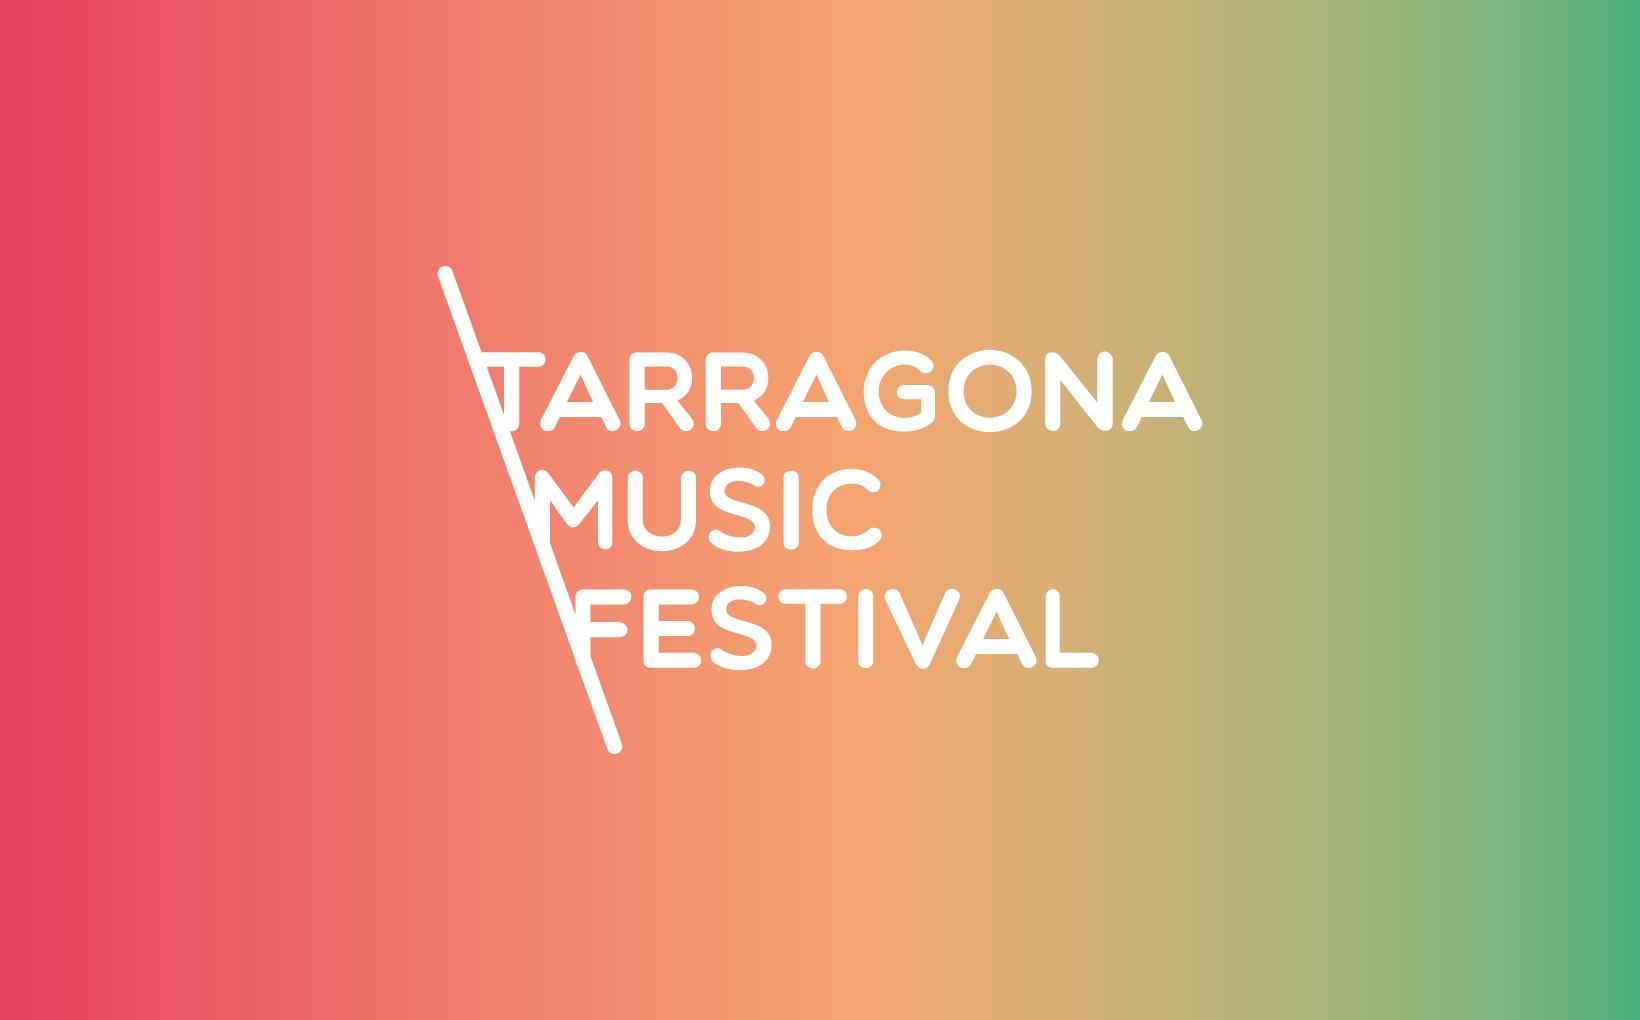 tarragonamusicfestival